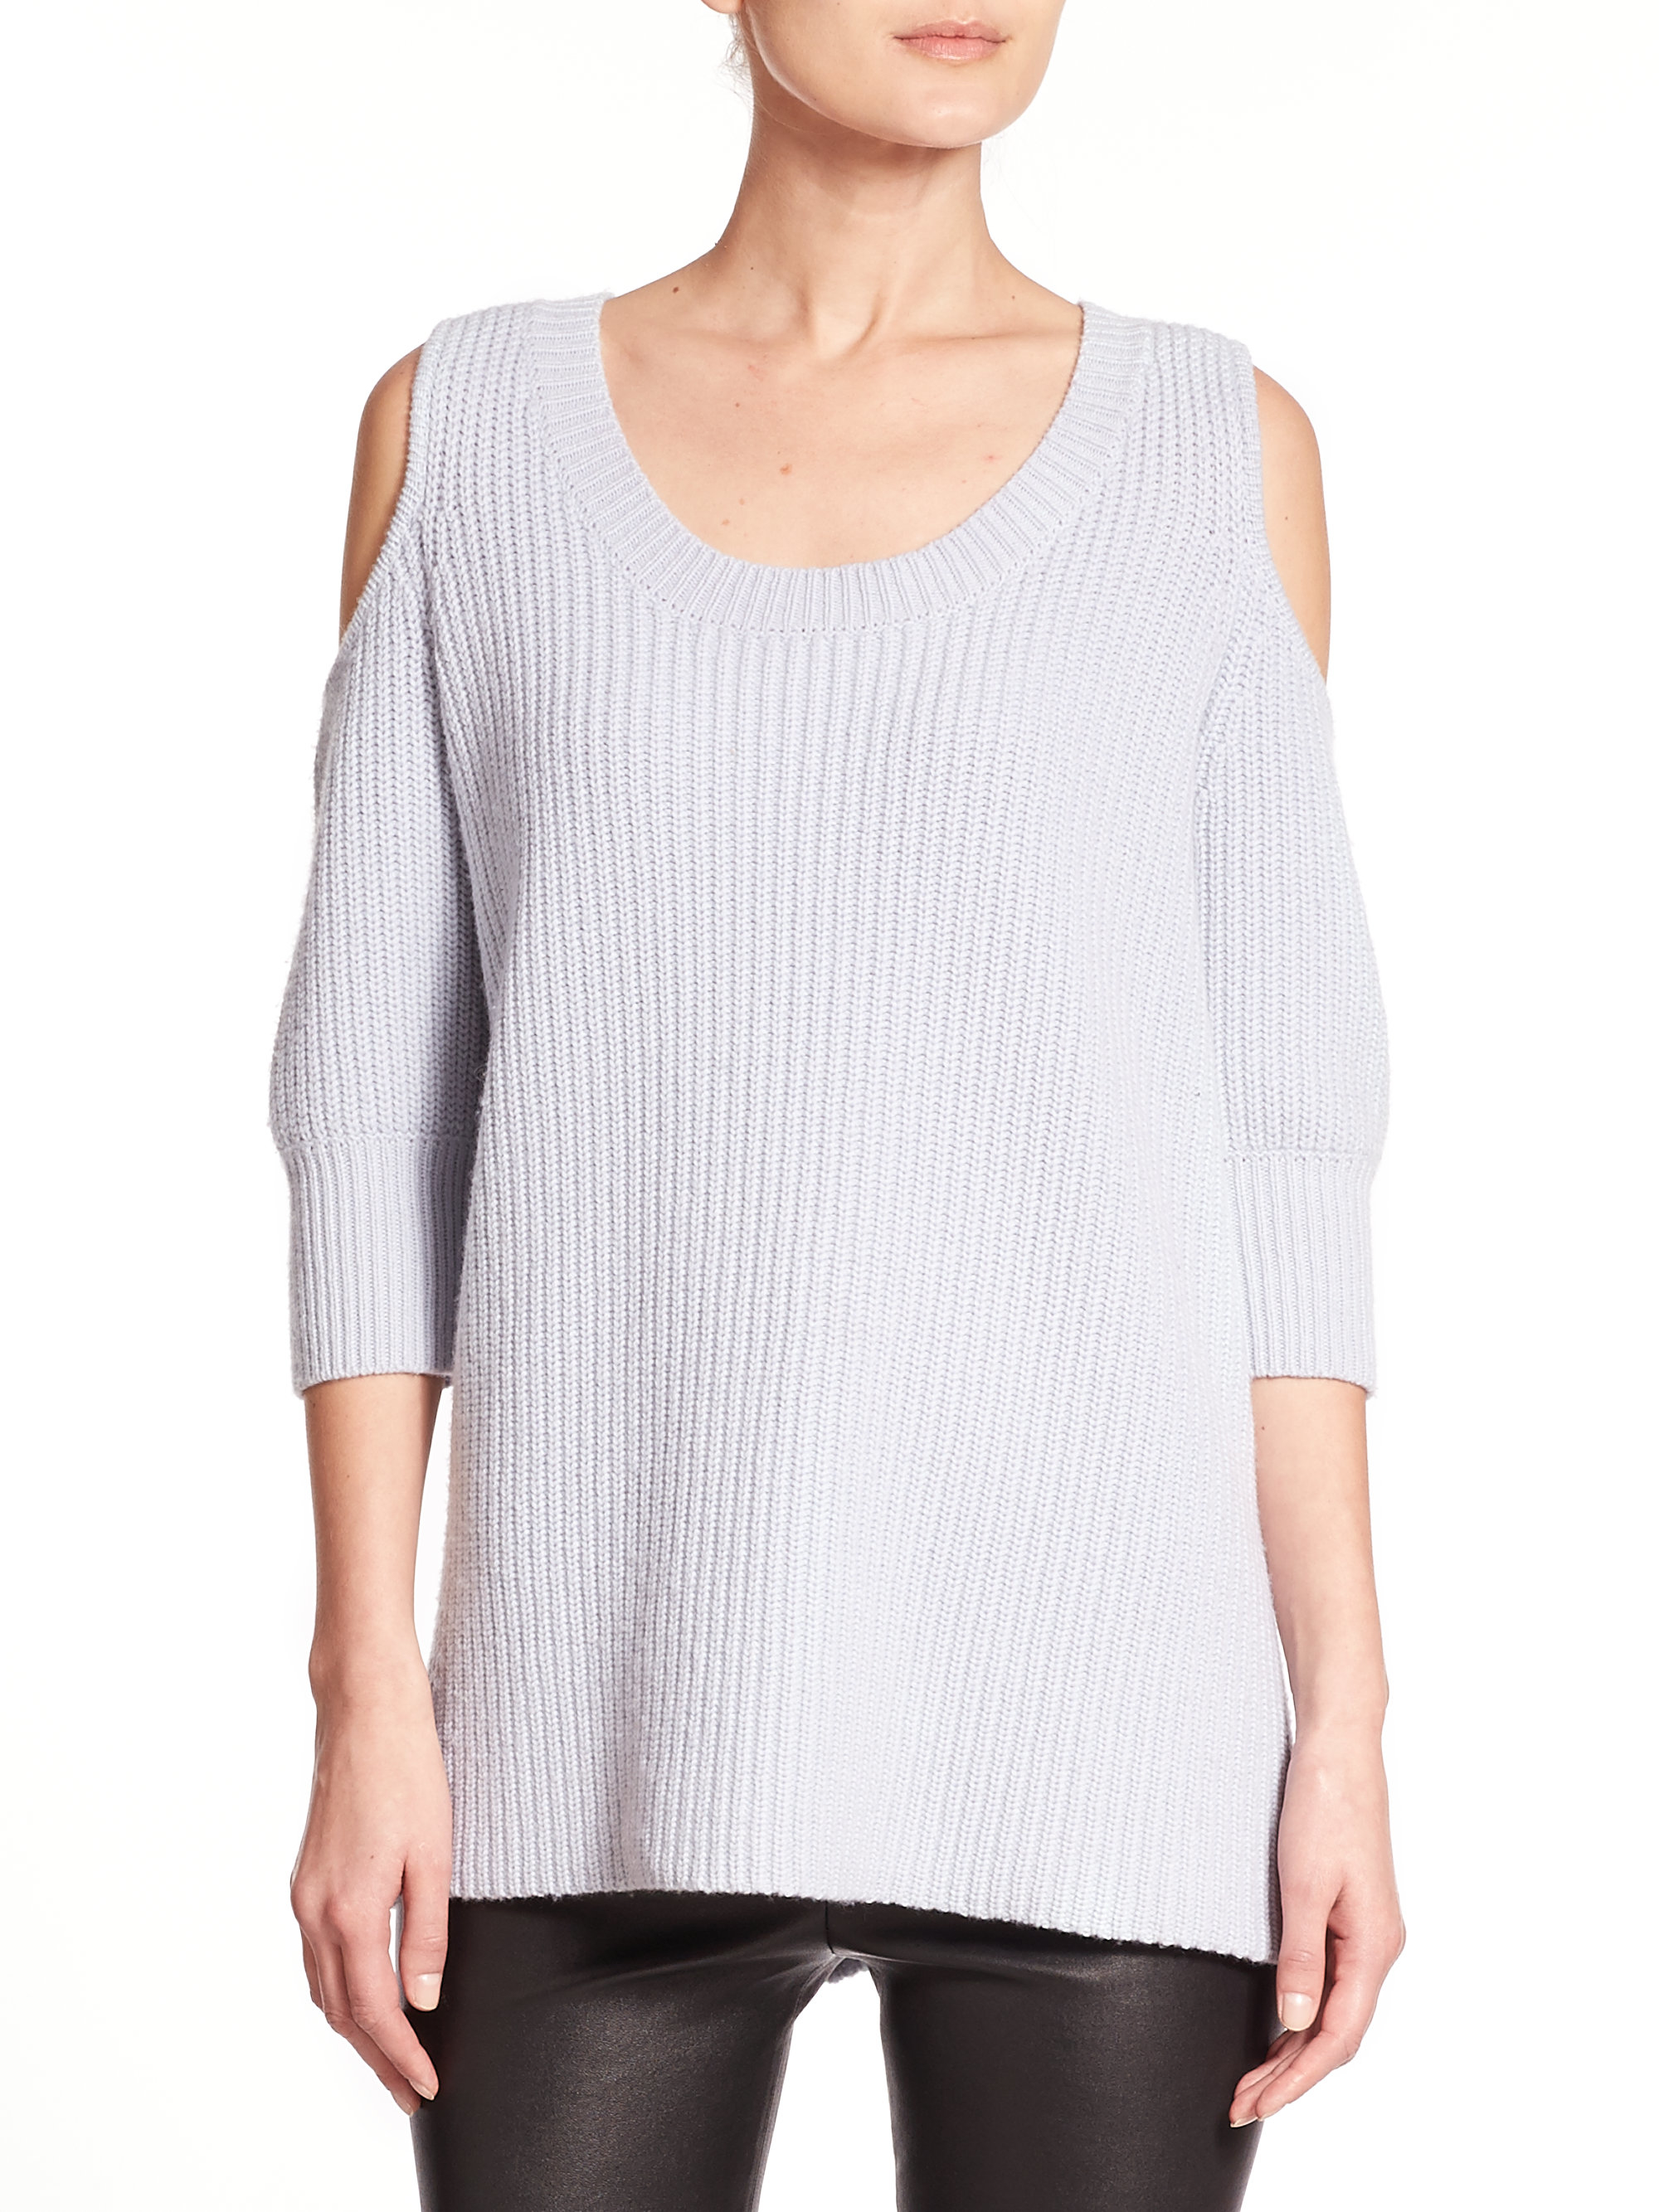 ad392bca33c Zoe Jordan Dias Wool & Cashmere Cold-shoulder Sweater in Blue - Lyst